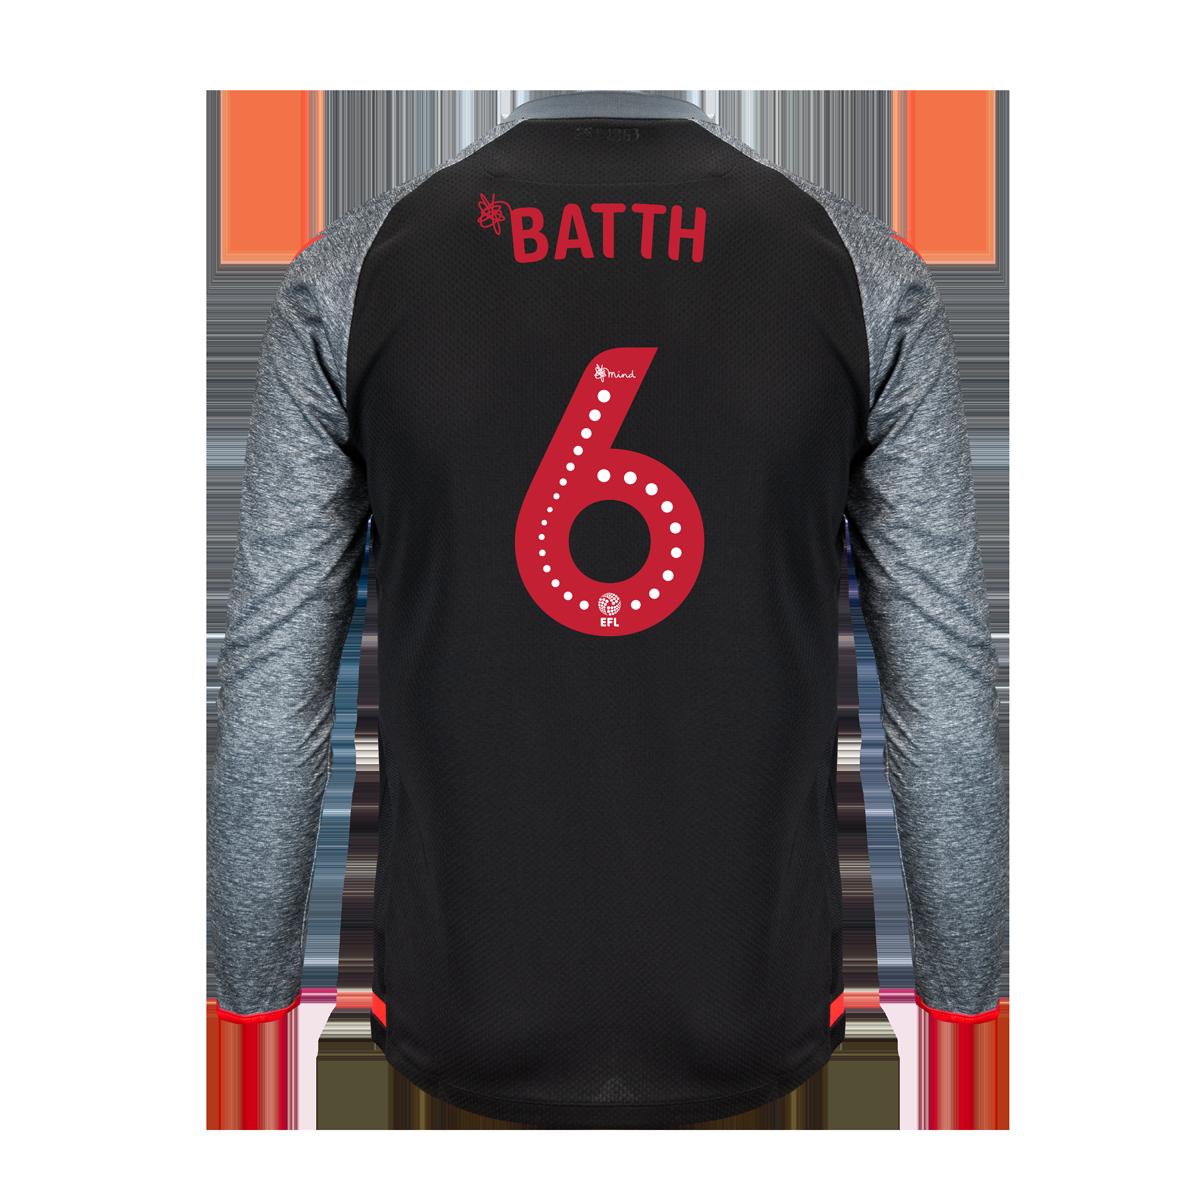 2019/20 Adult Away LS Shirt - Batth